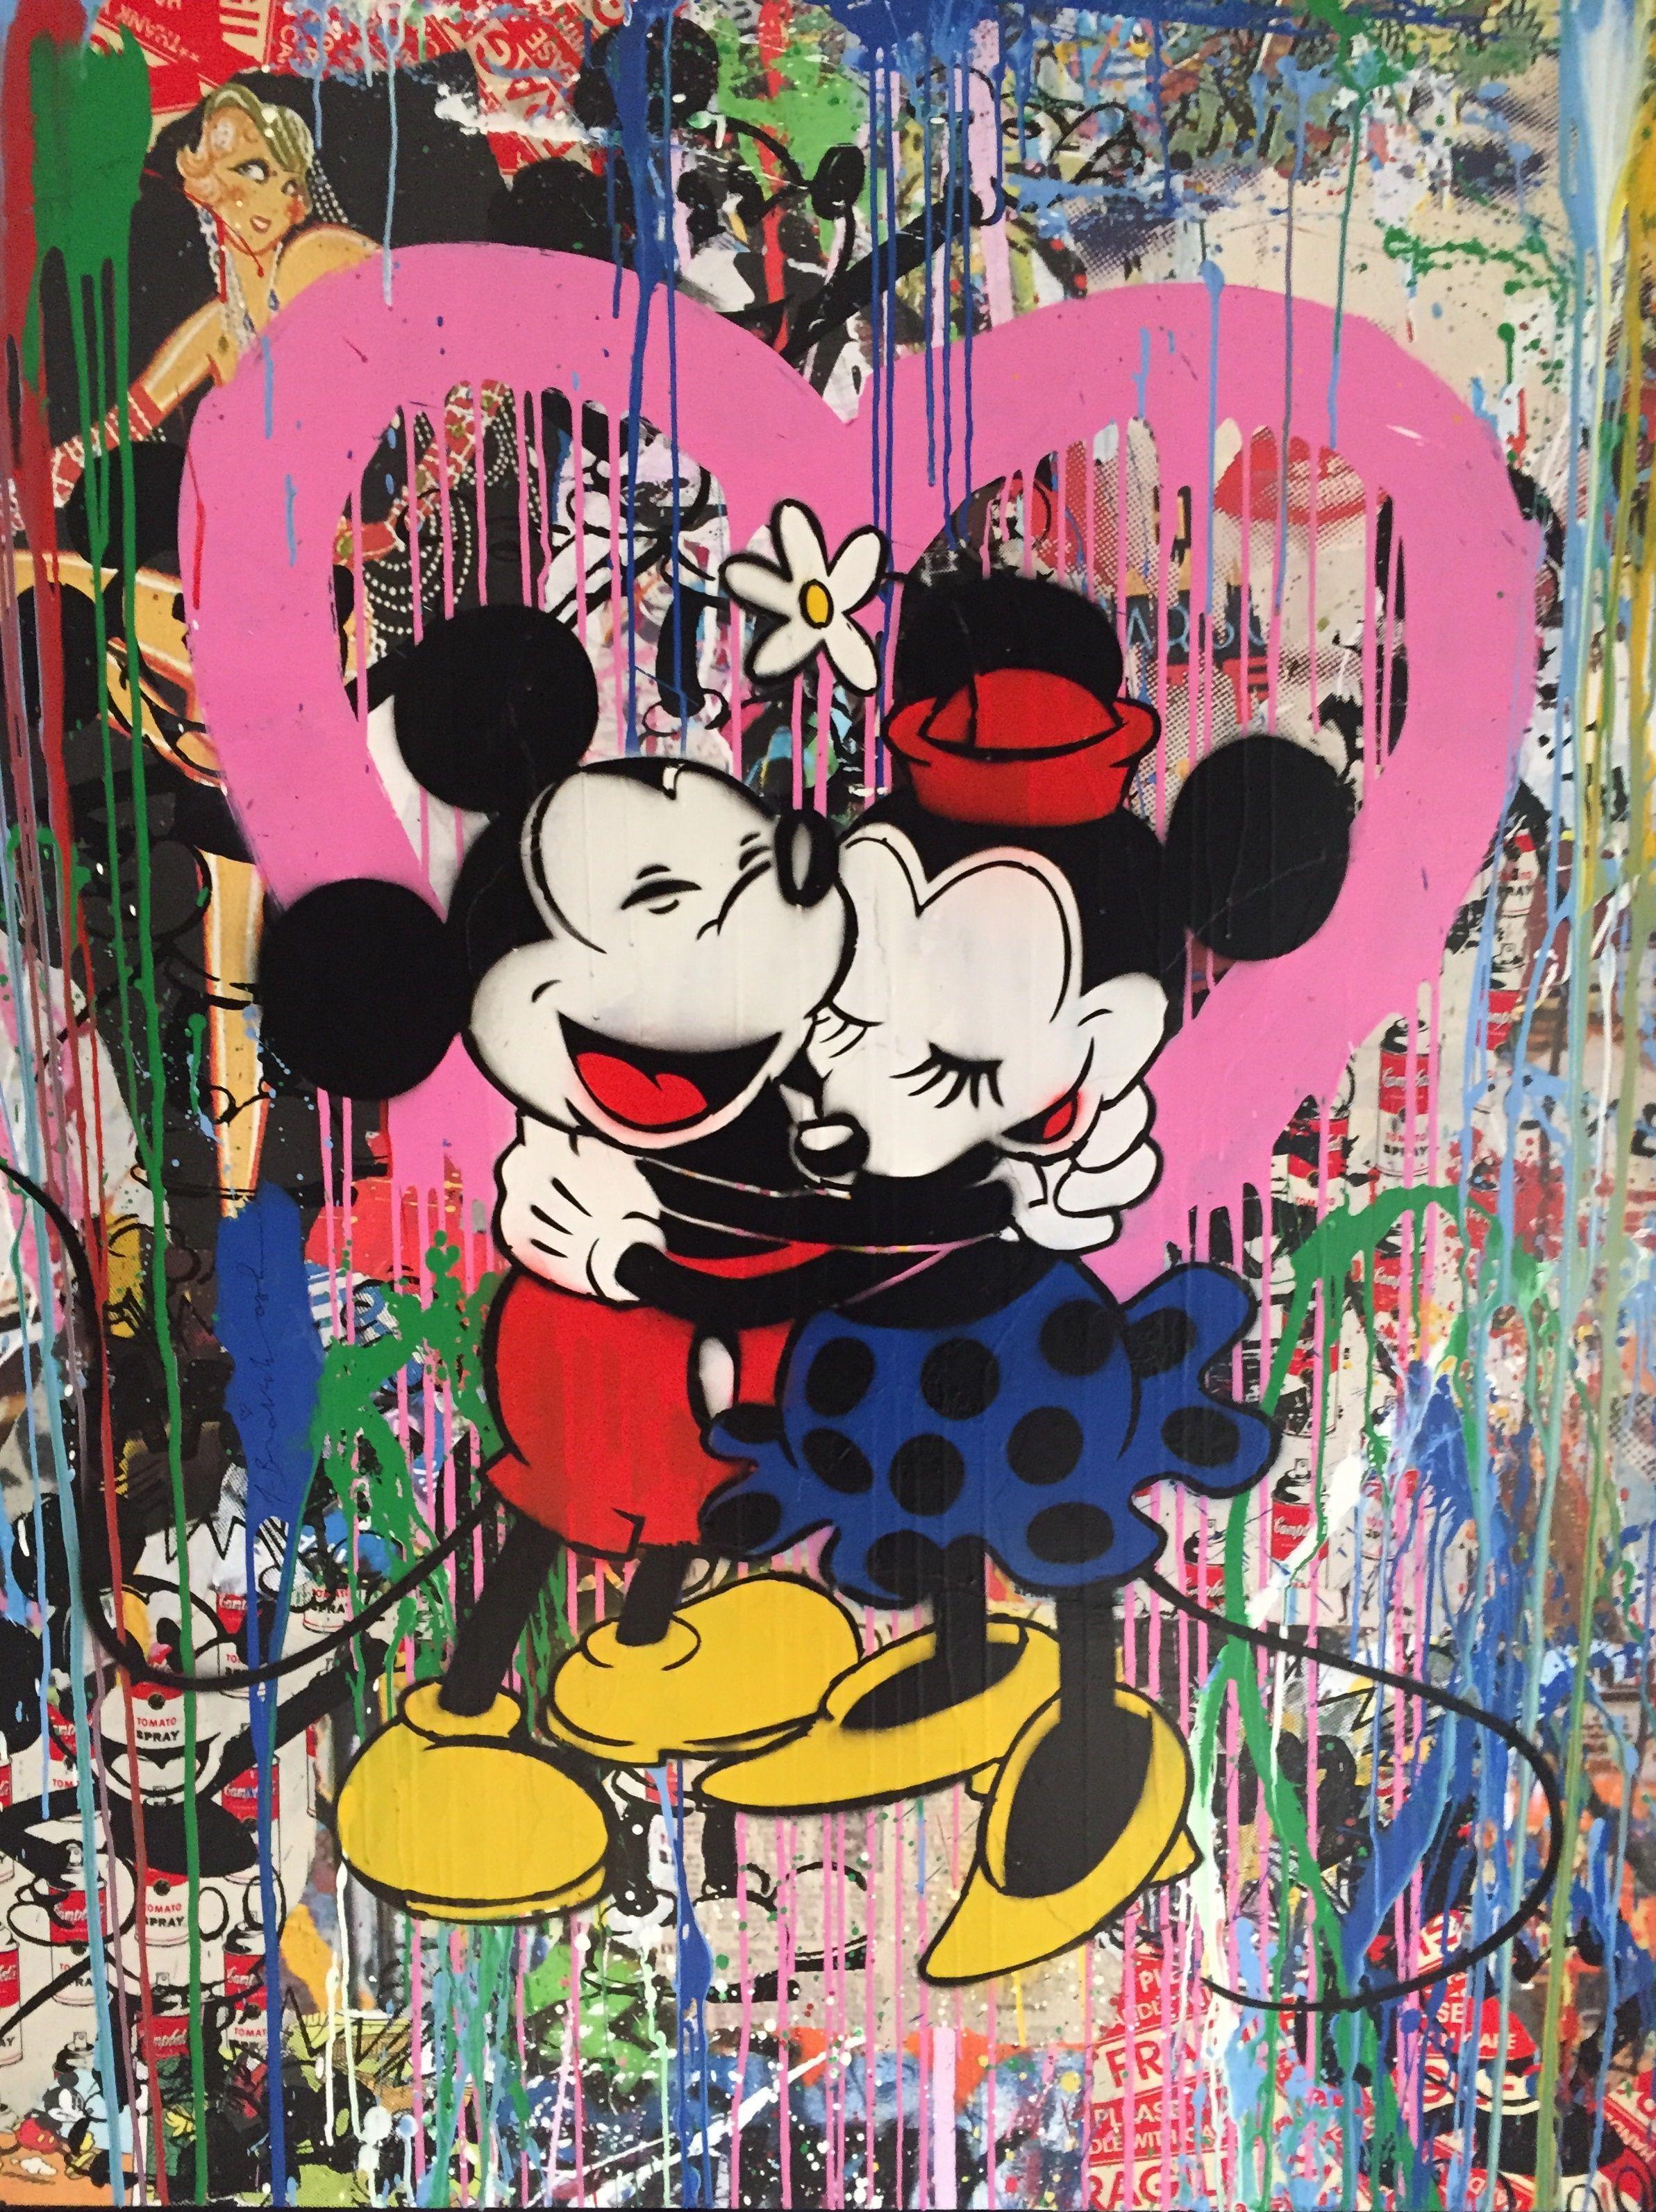 Mr brainwash galeries bartoux art pop urban for Mural painted by street artist mr brainwash